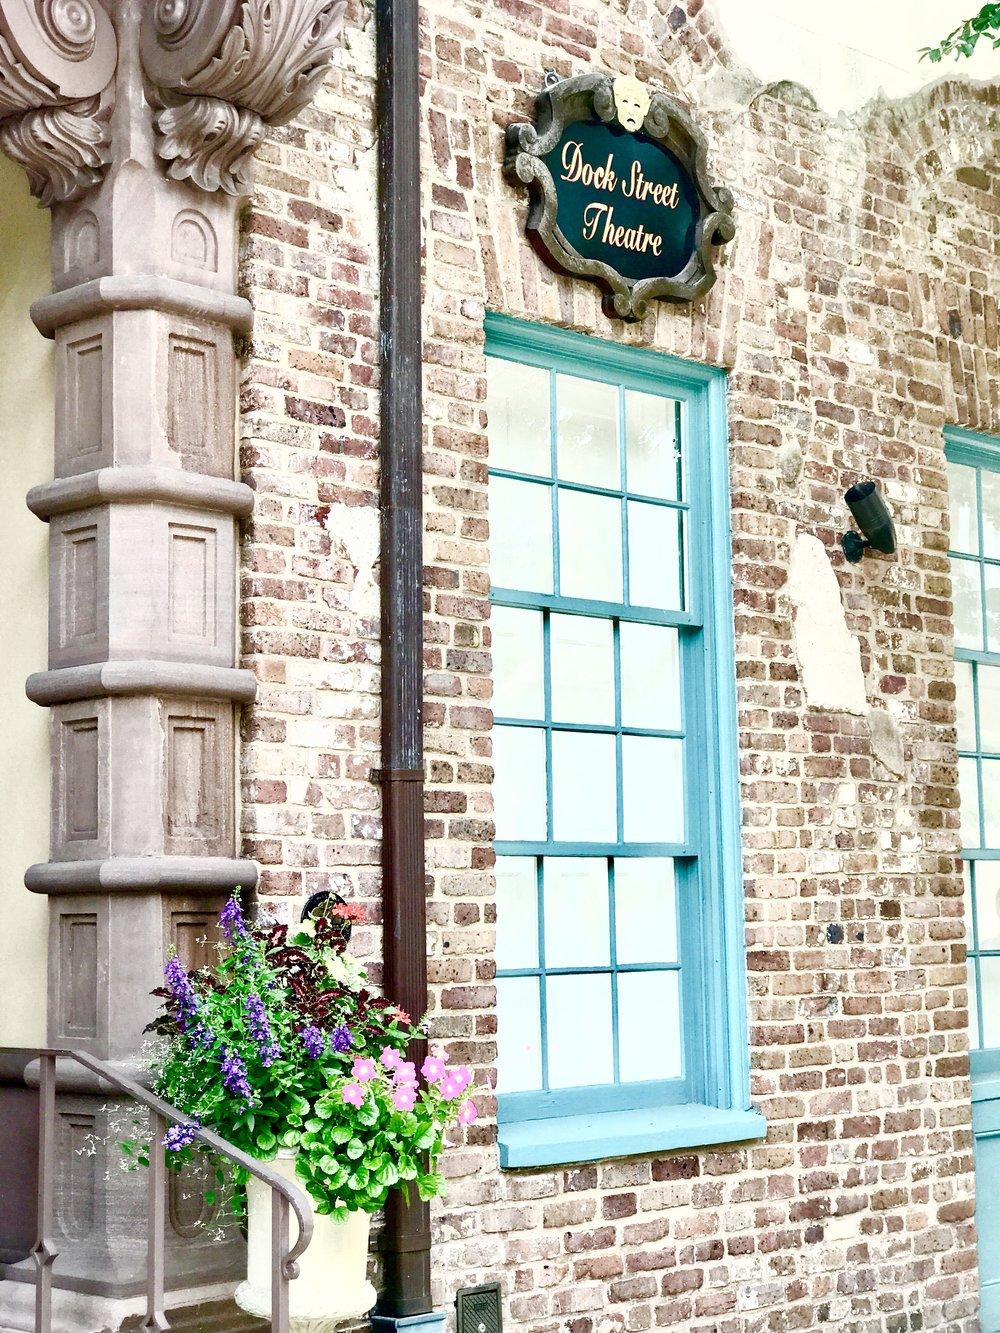 Dock Street Theatre -